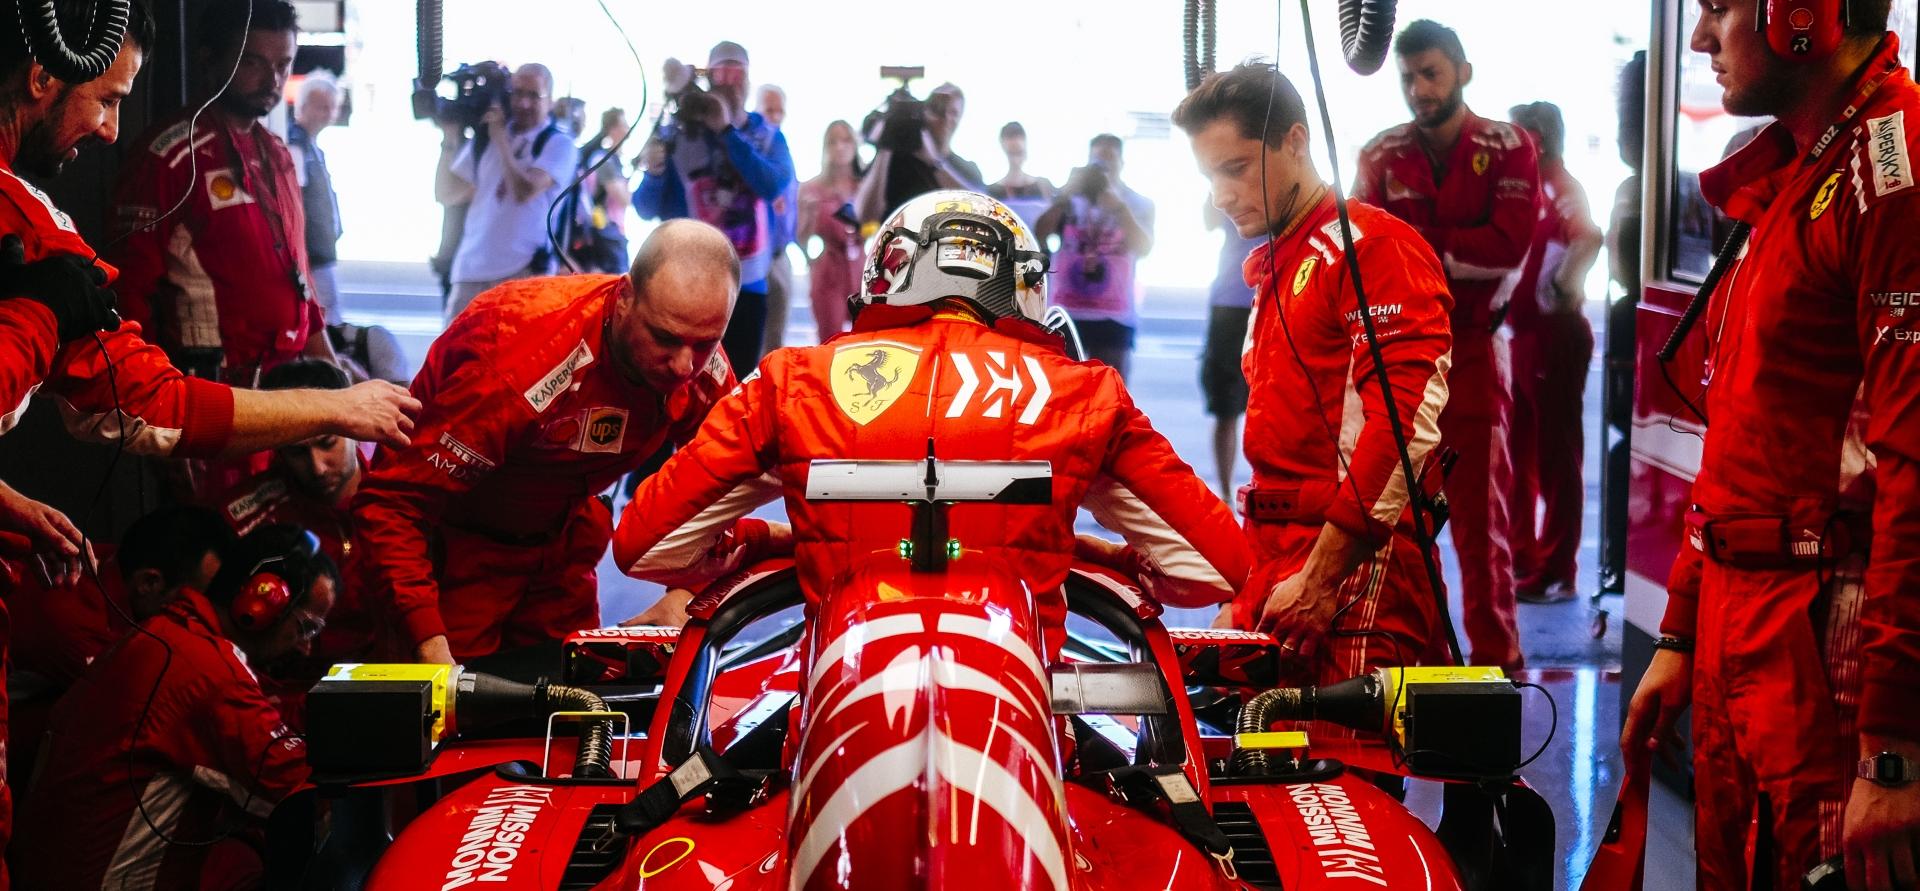 Philip Morris International i Scuderia Ferrari okreću se budućnosti kroz Misiju Winnow